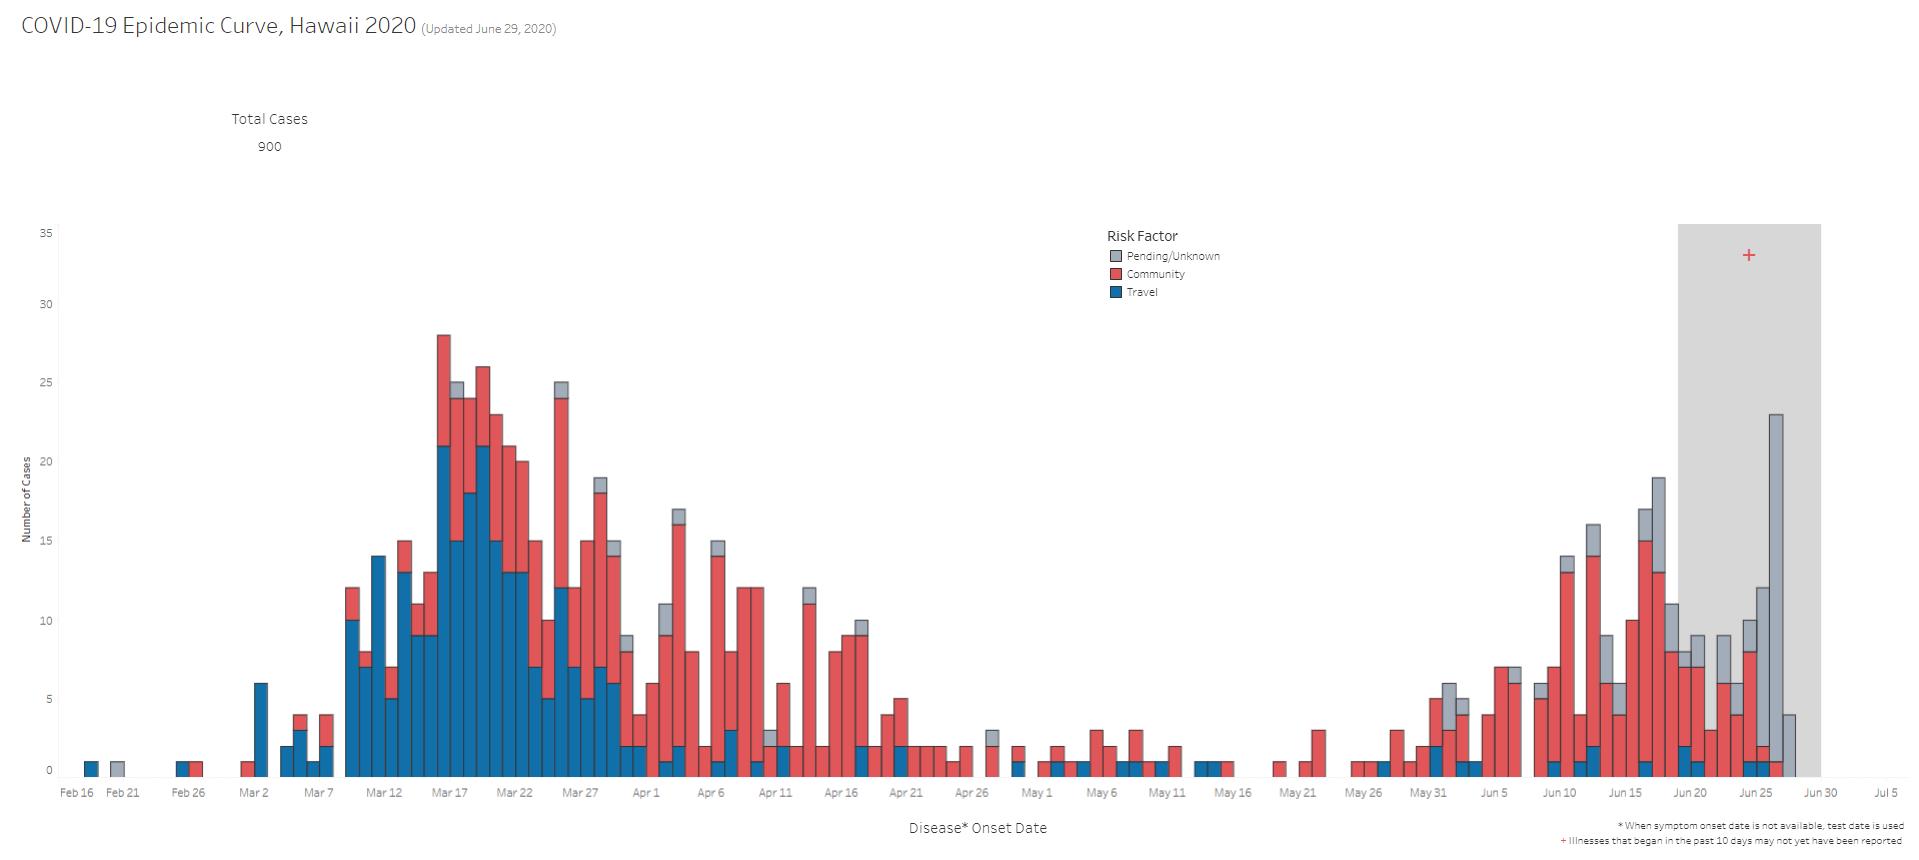 COVID-19 Epidemic Curve Updated June 29, 2020